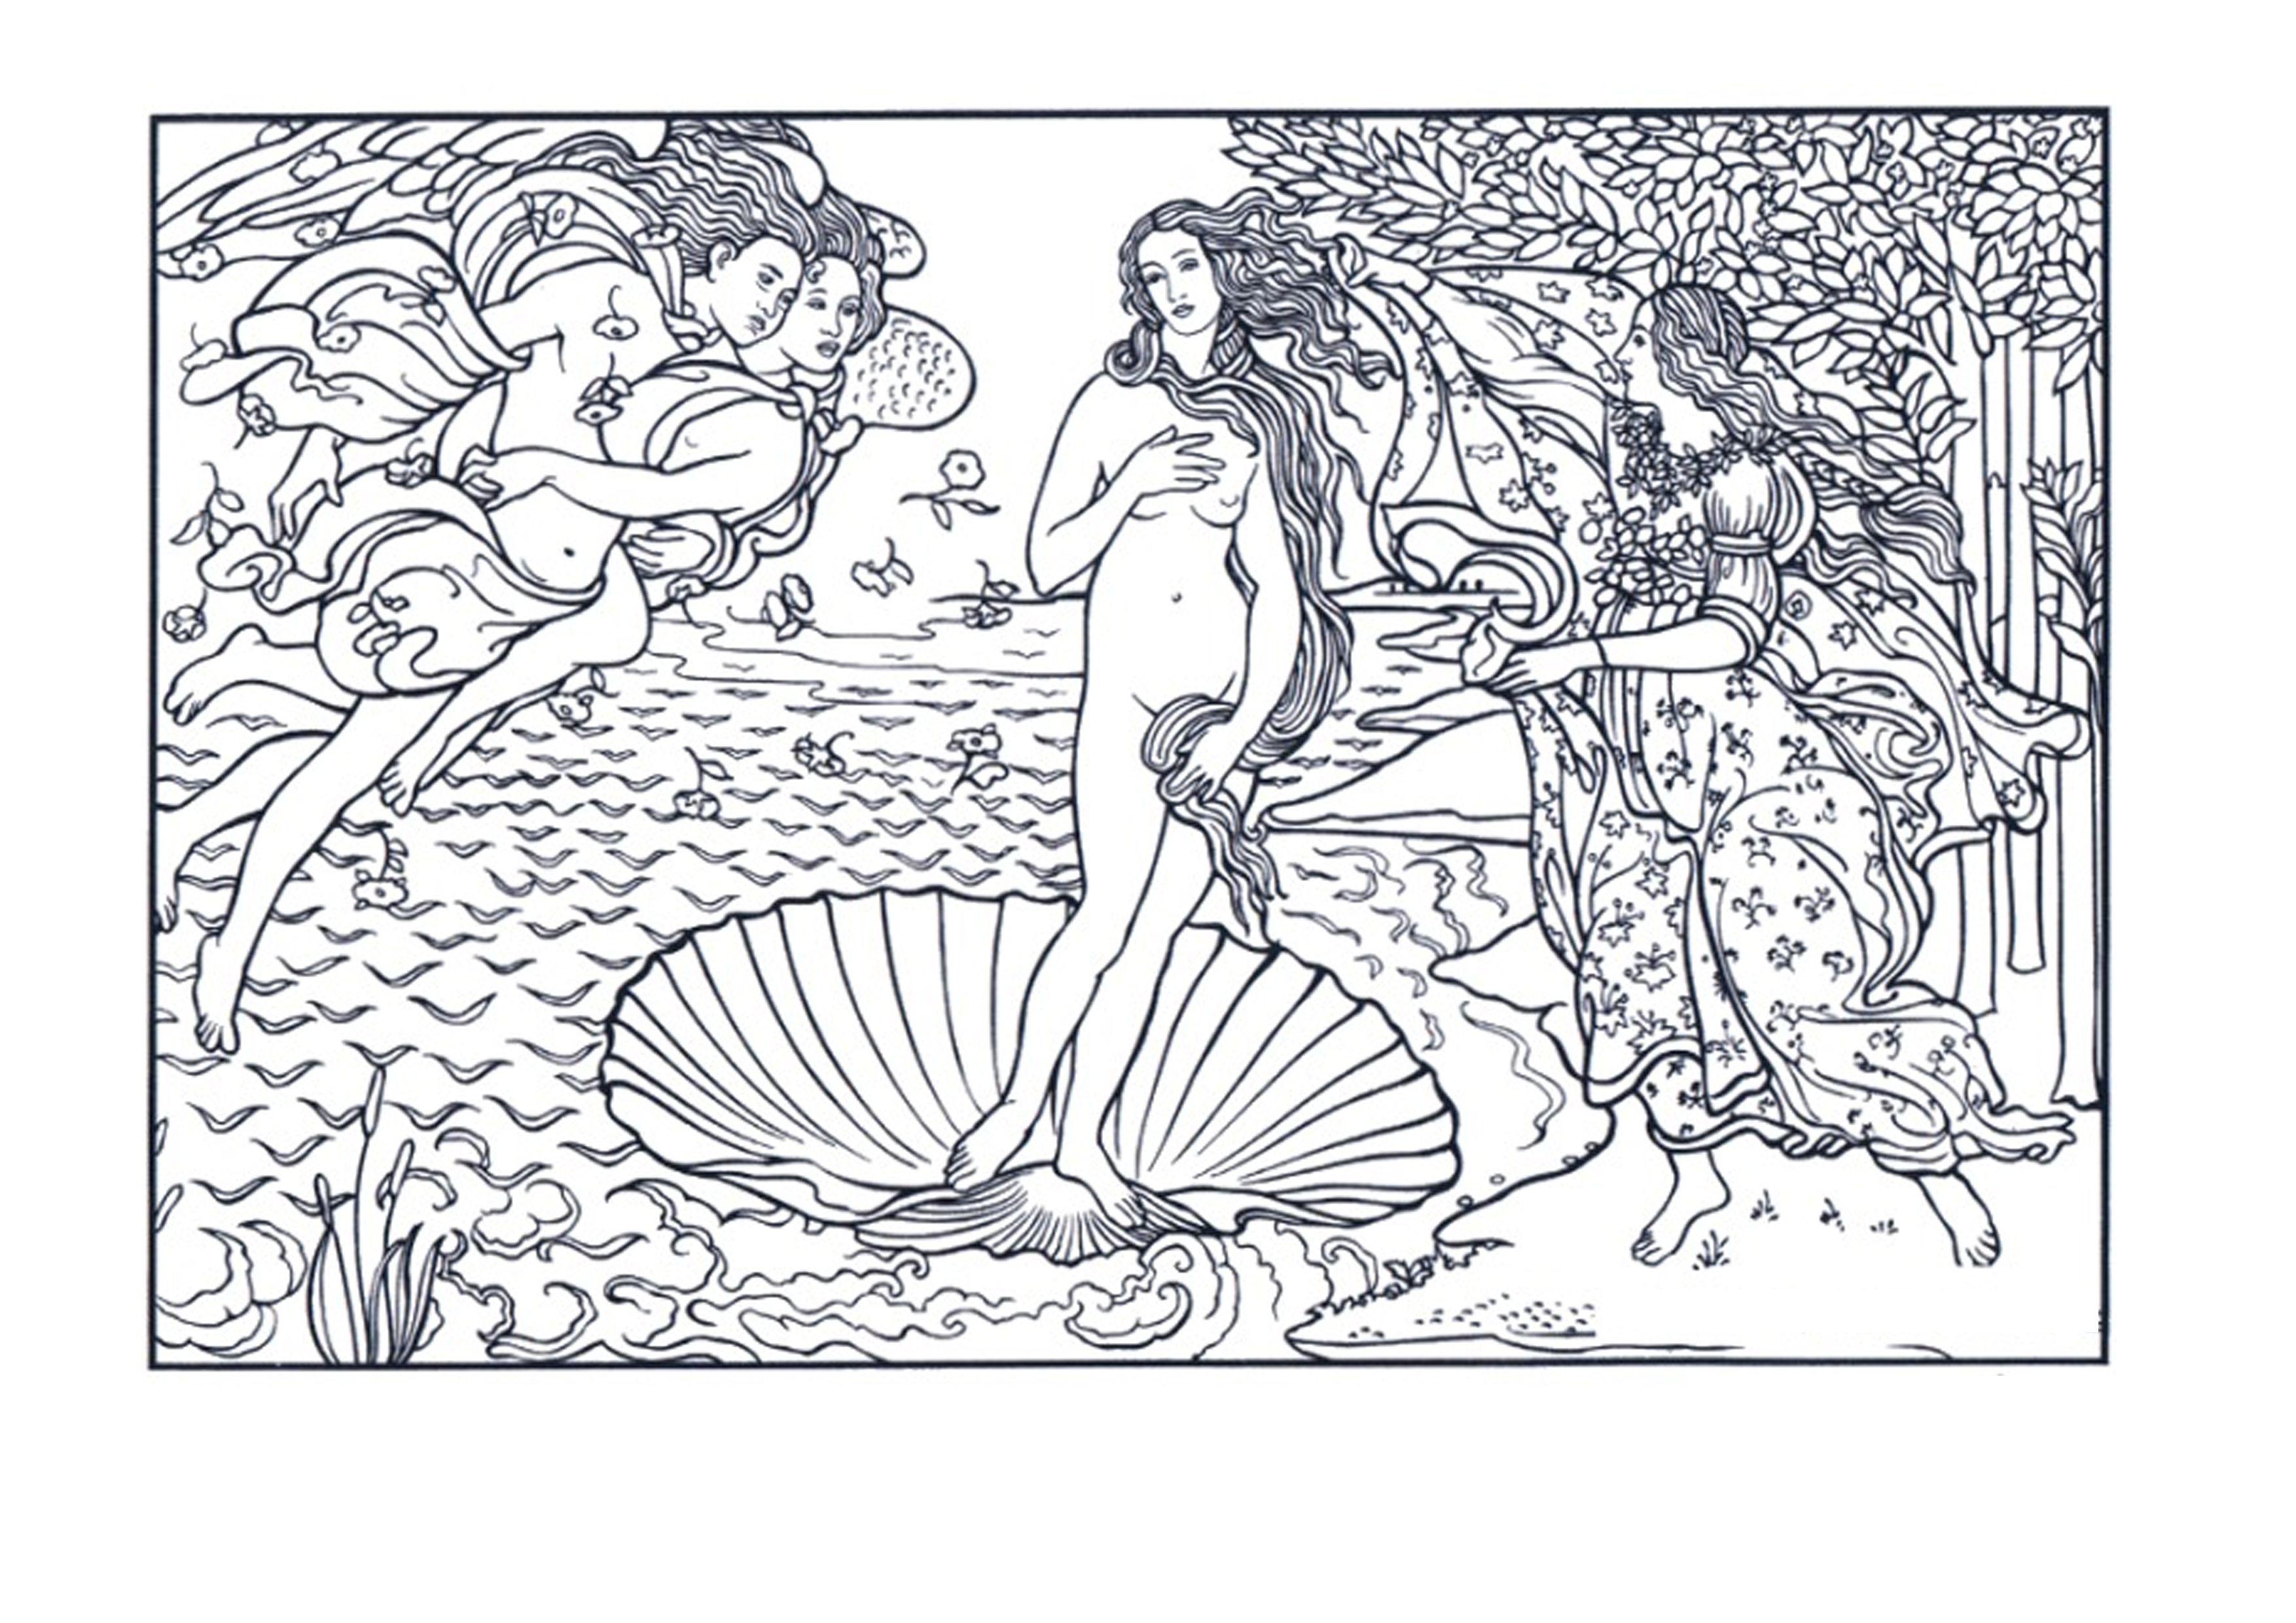 El nacimiento de Venus. Botticelli | ΖΩΓΡΑΦΟΙ | Pinterest